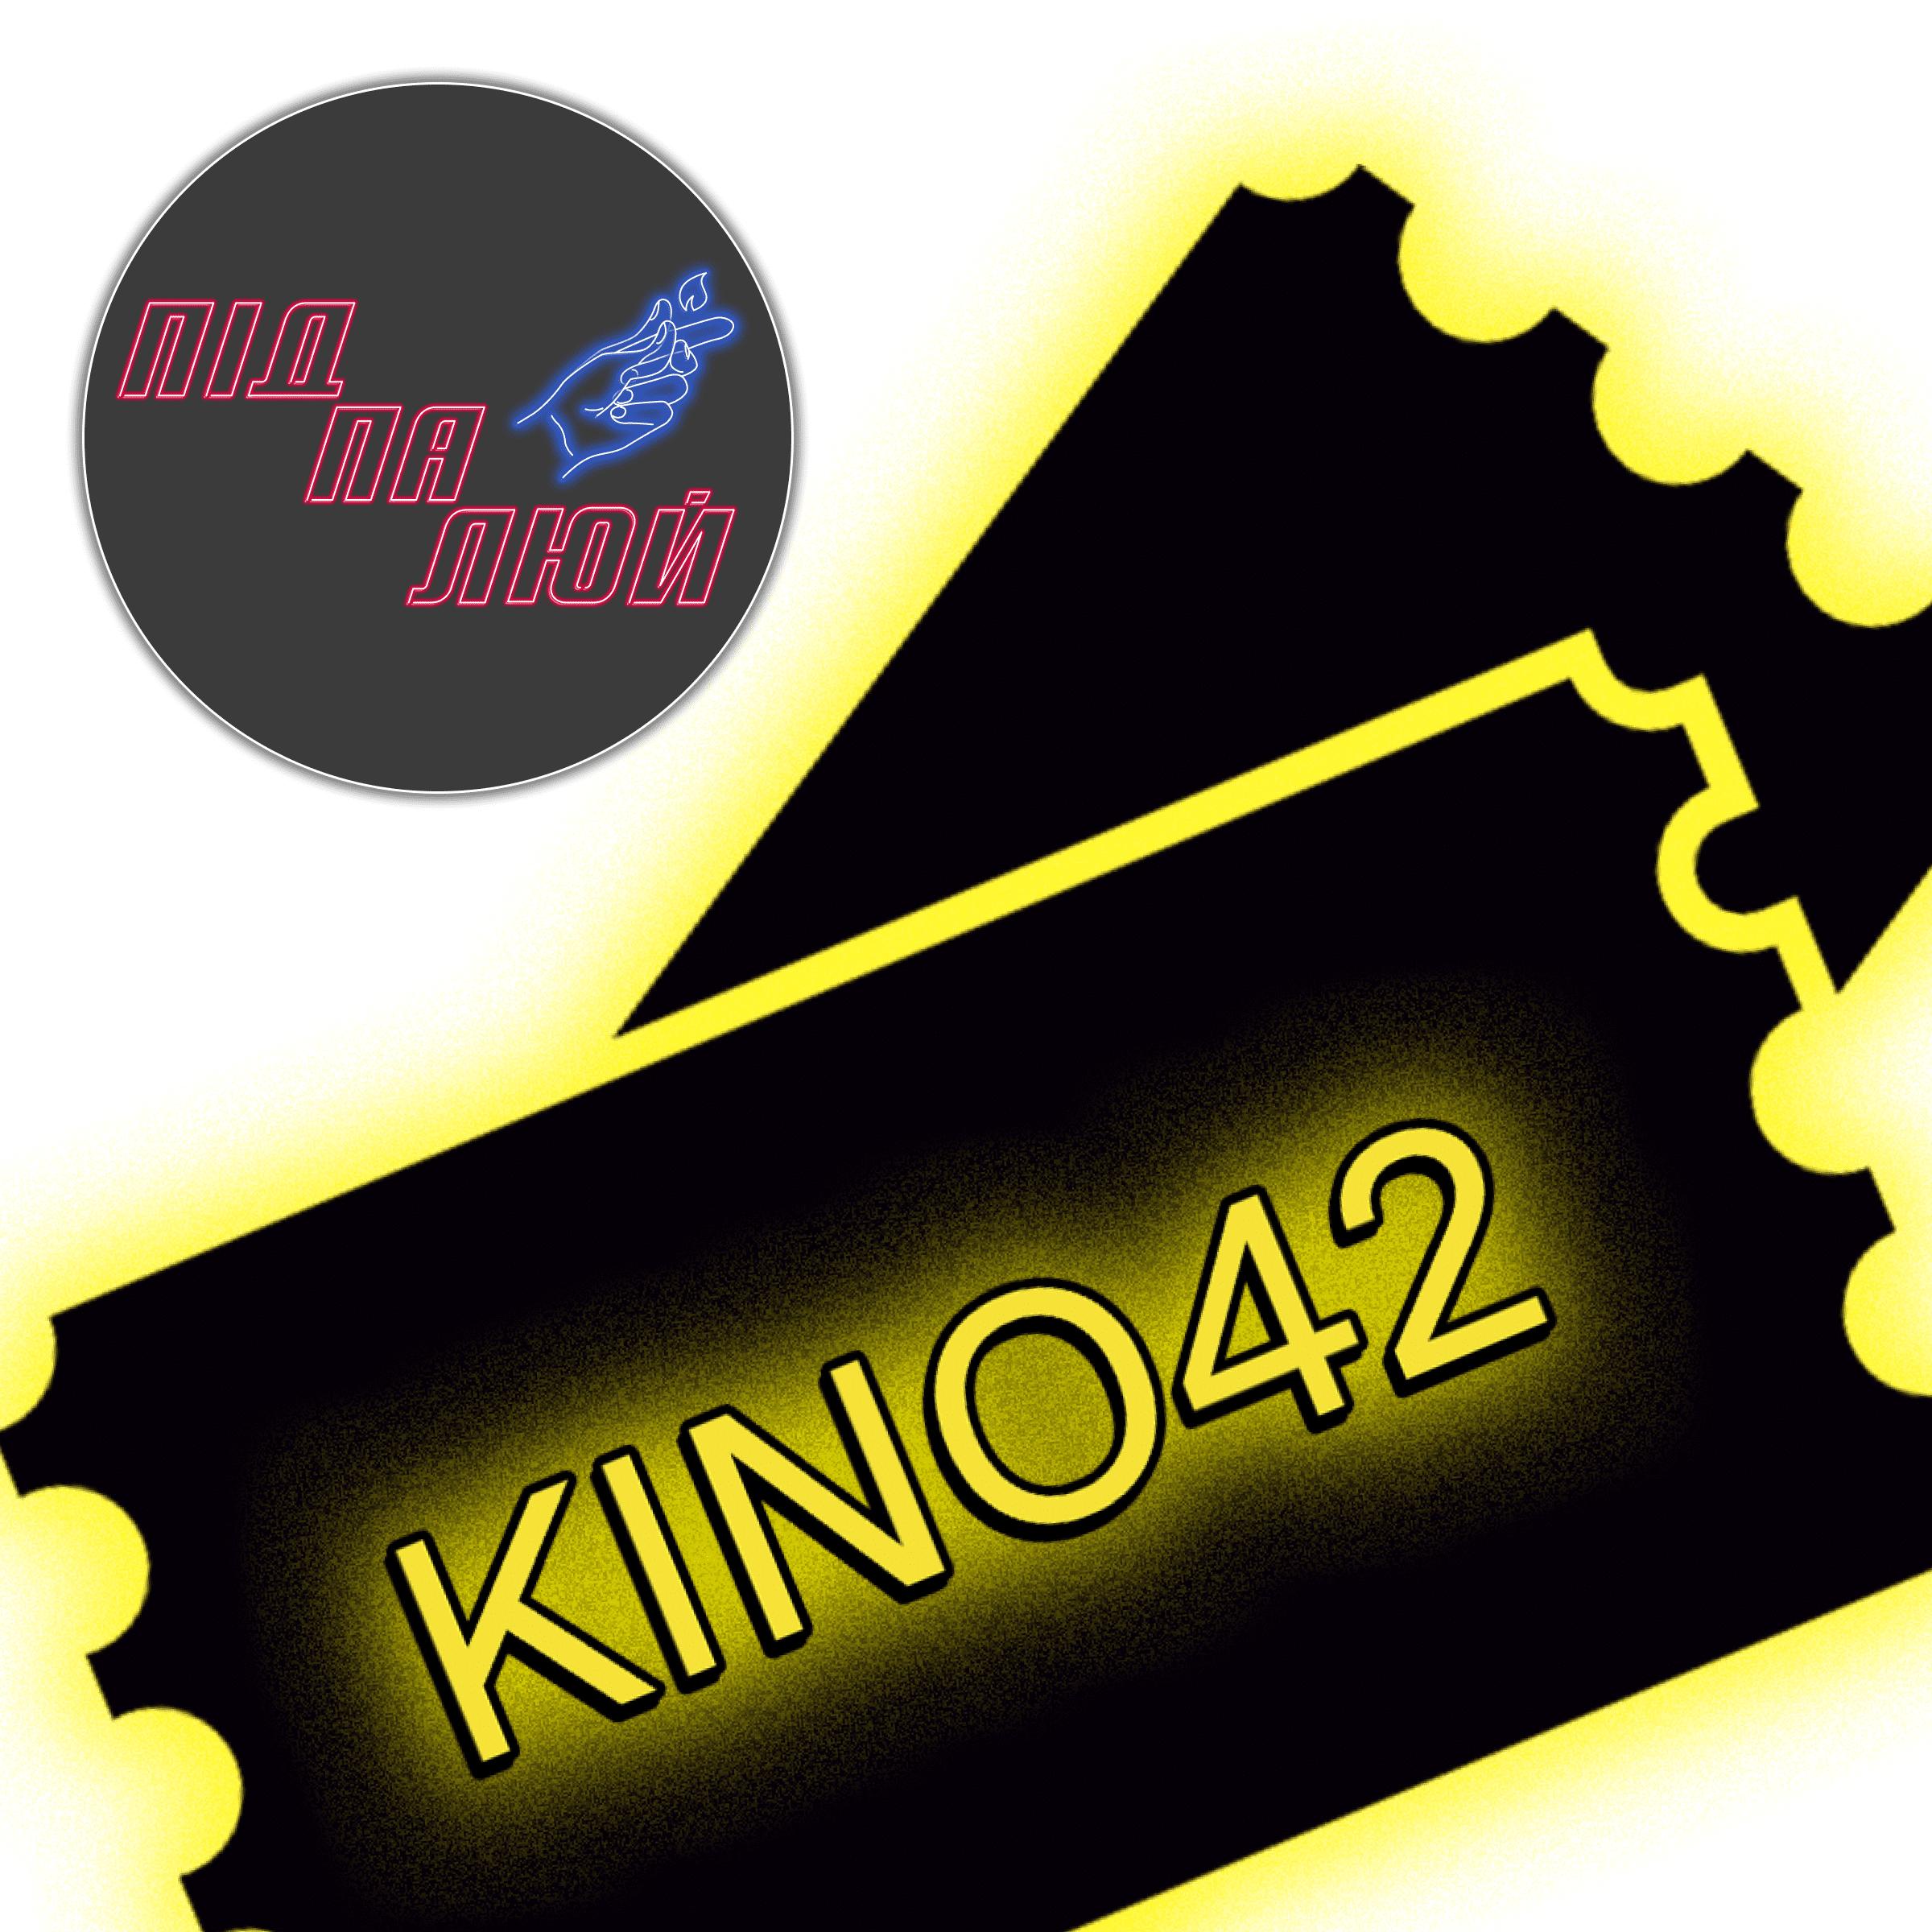 kino 42 two tickets - UPHA Made in Ukraine - Заборона